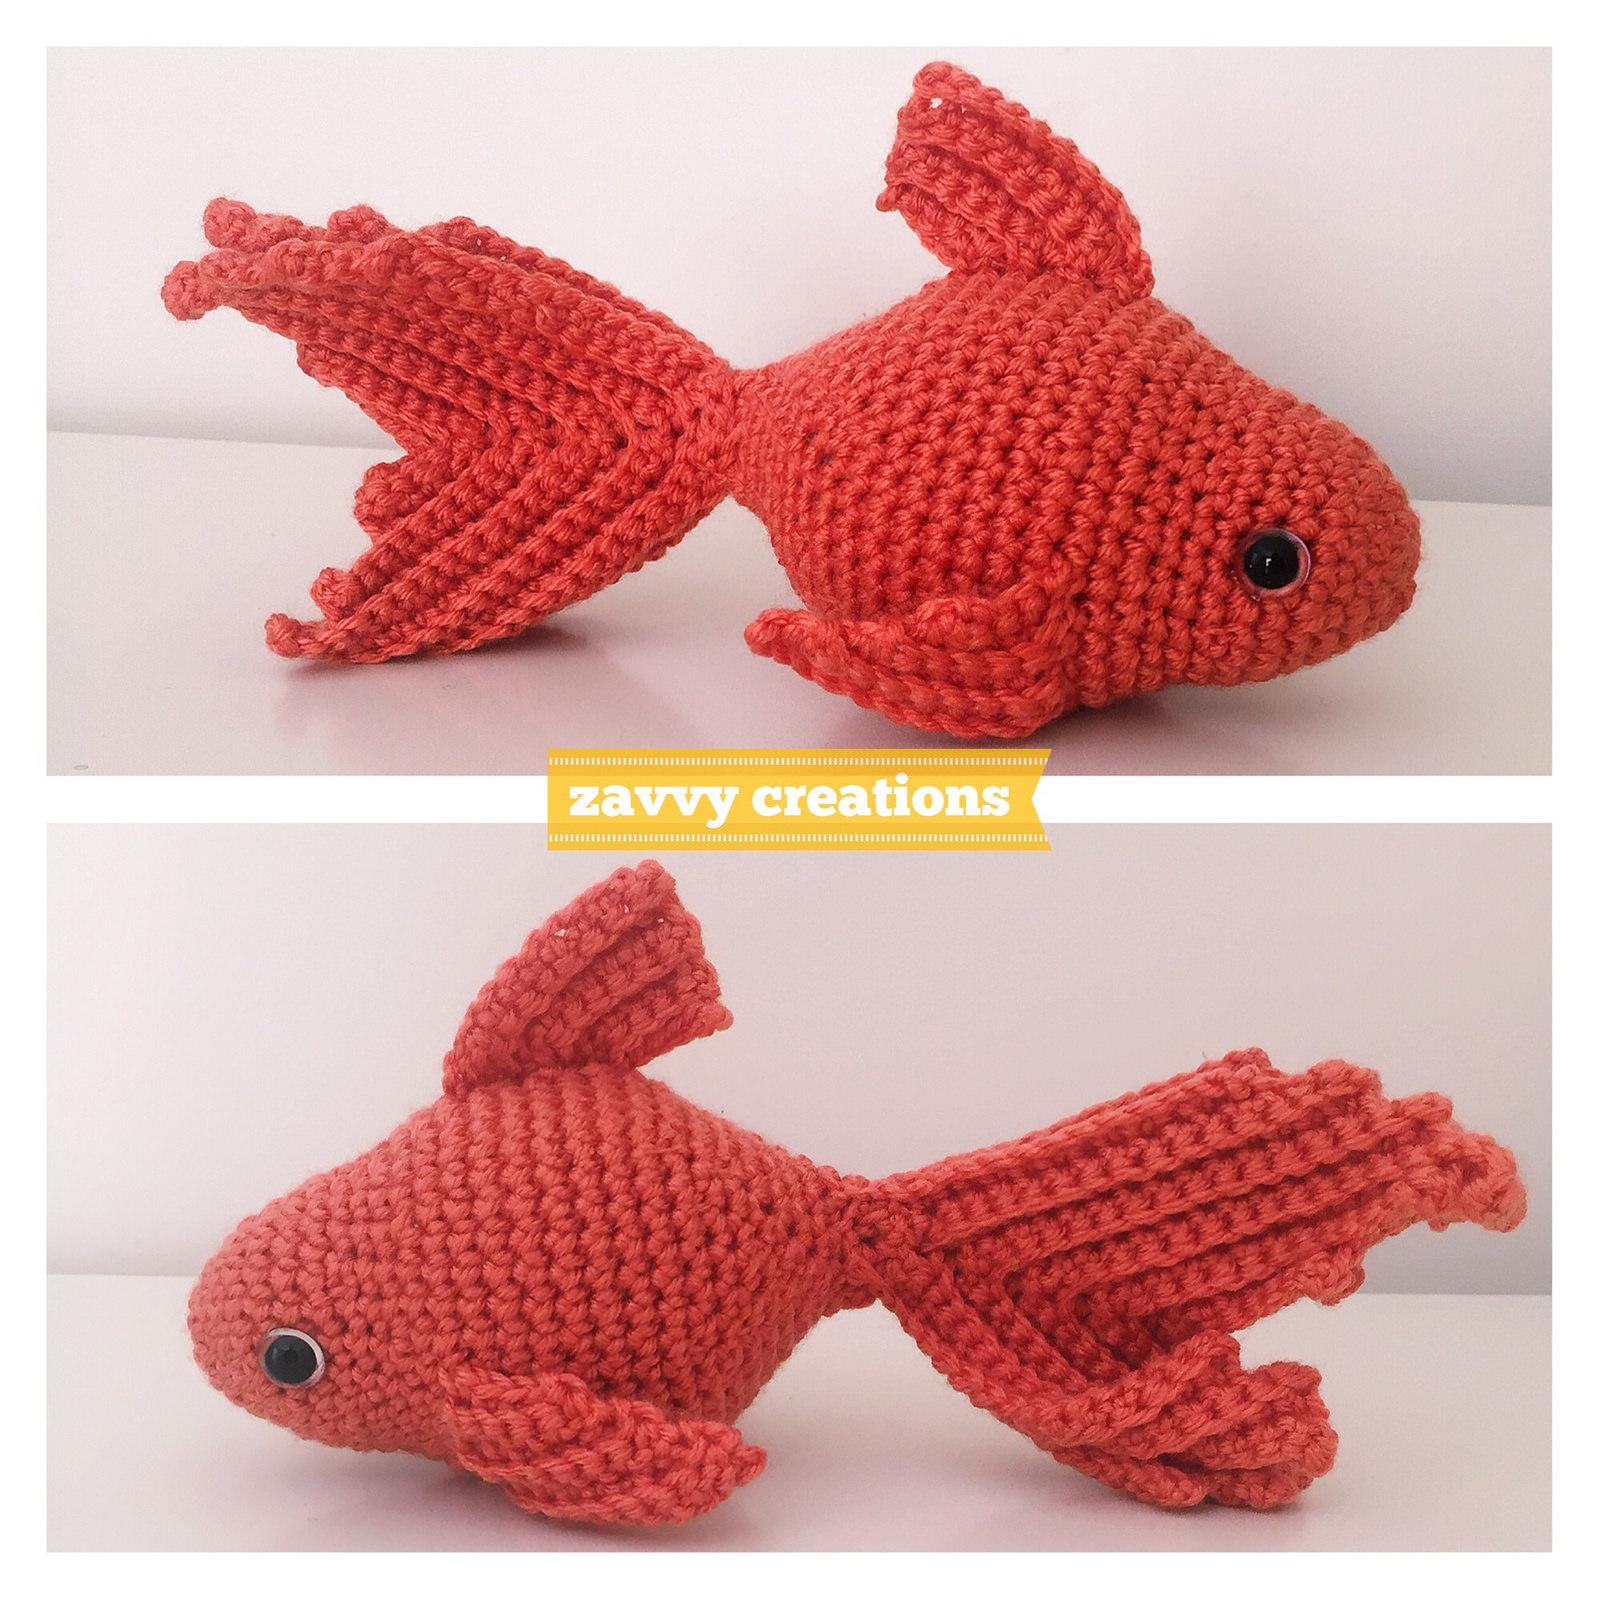 Little Fish Amigurumi Free Crochet Pattern – Crochetfuldiy.com   1600x1600